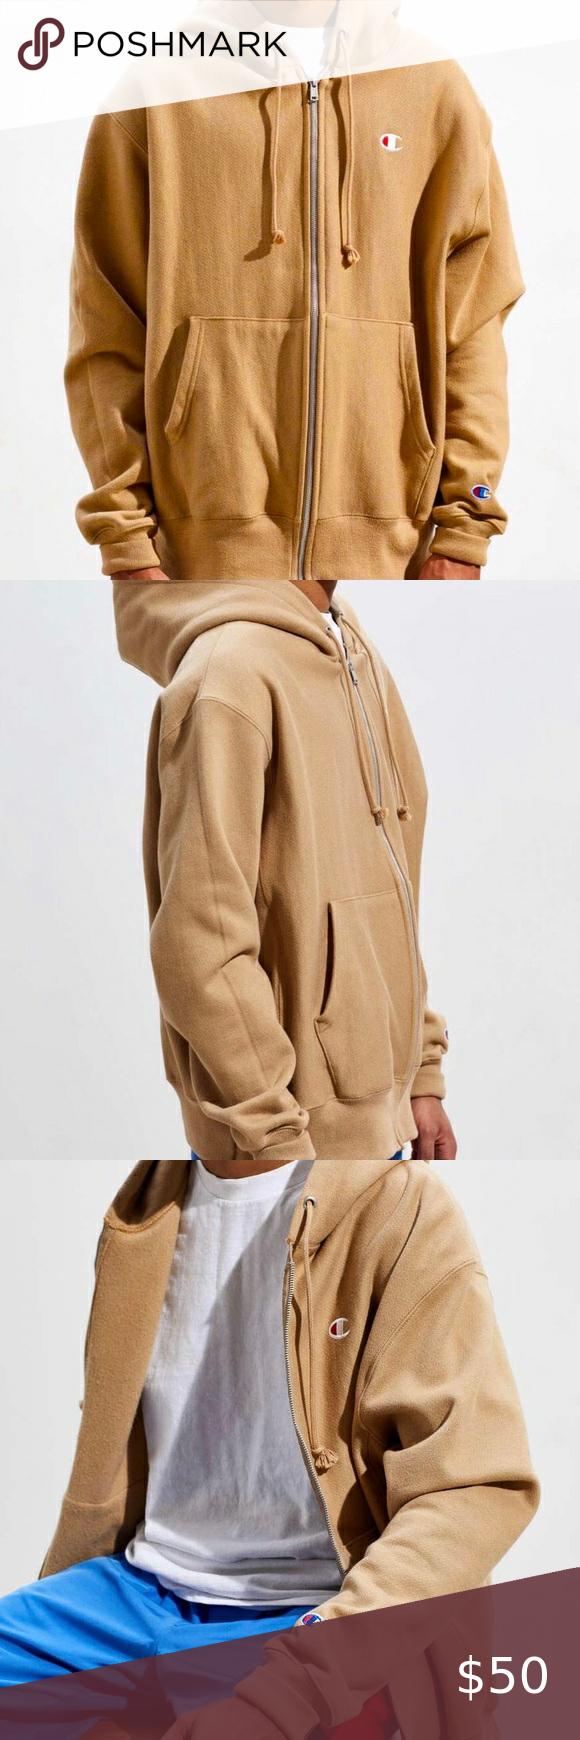 Champion Reverse Weave Zip Up Hoodie Tan Khaki Nwt Sweatshirt Outfit Men Hoodies Men Champion Reverse Weave [ 1740 x 580 Pixel ]